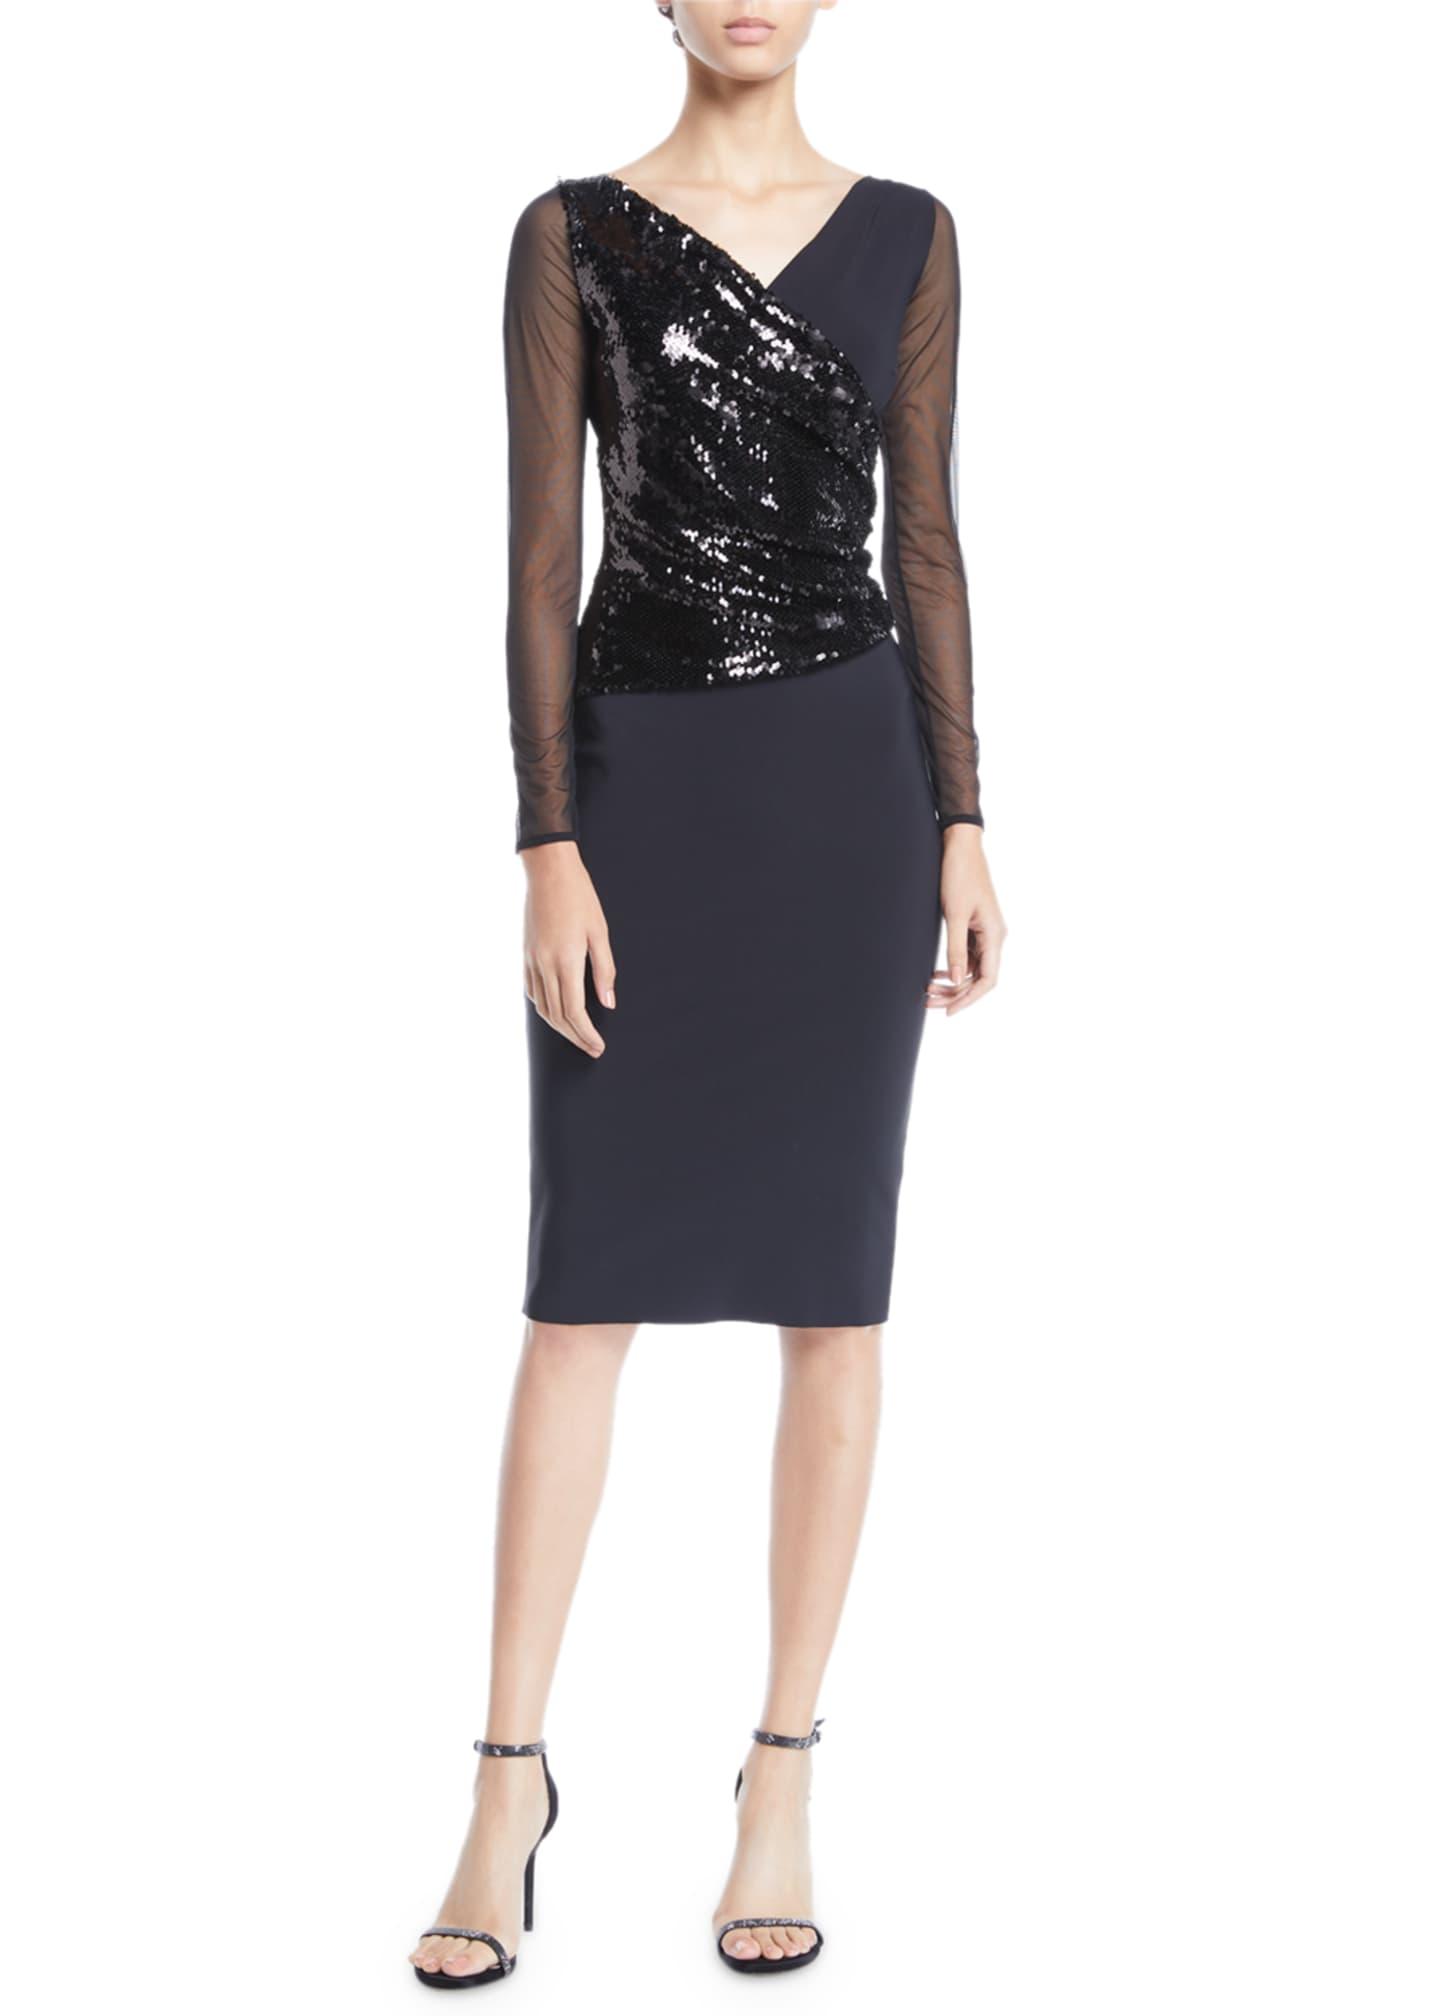 Chiara Boni La Petite Robe Hilaria Illusion Sparkle